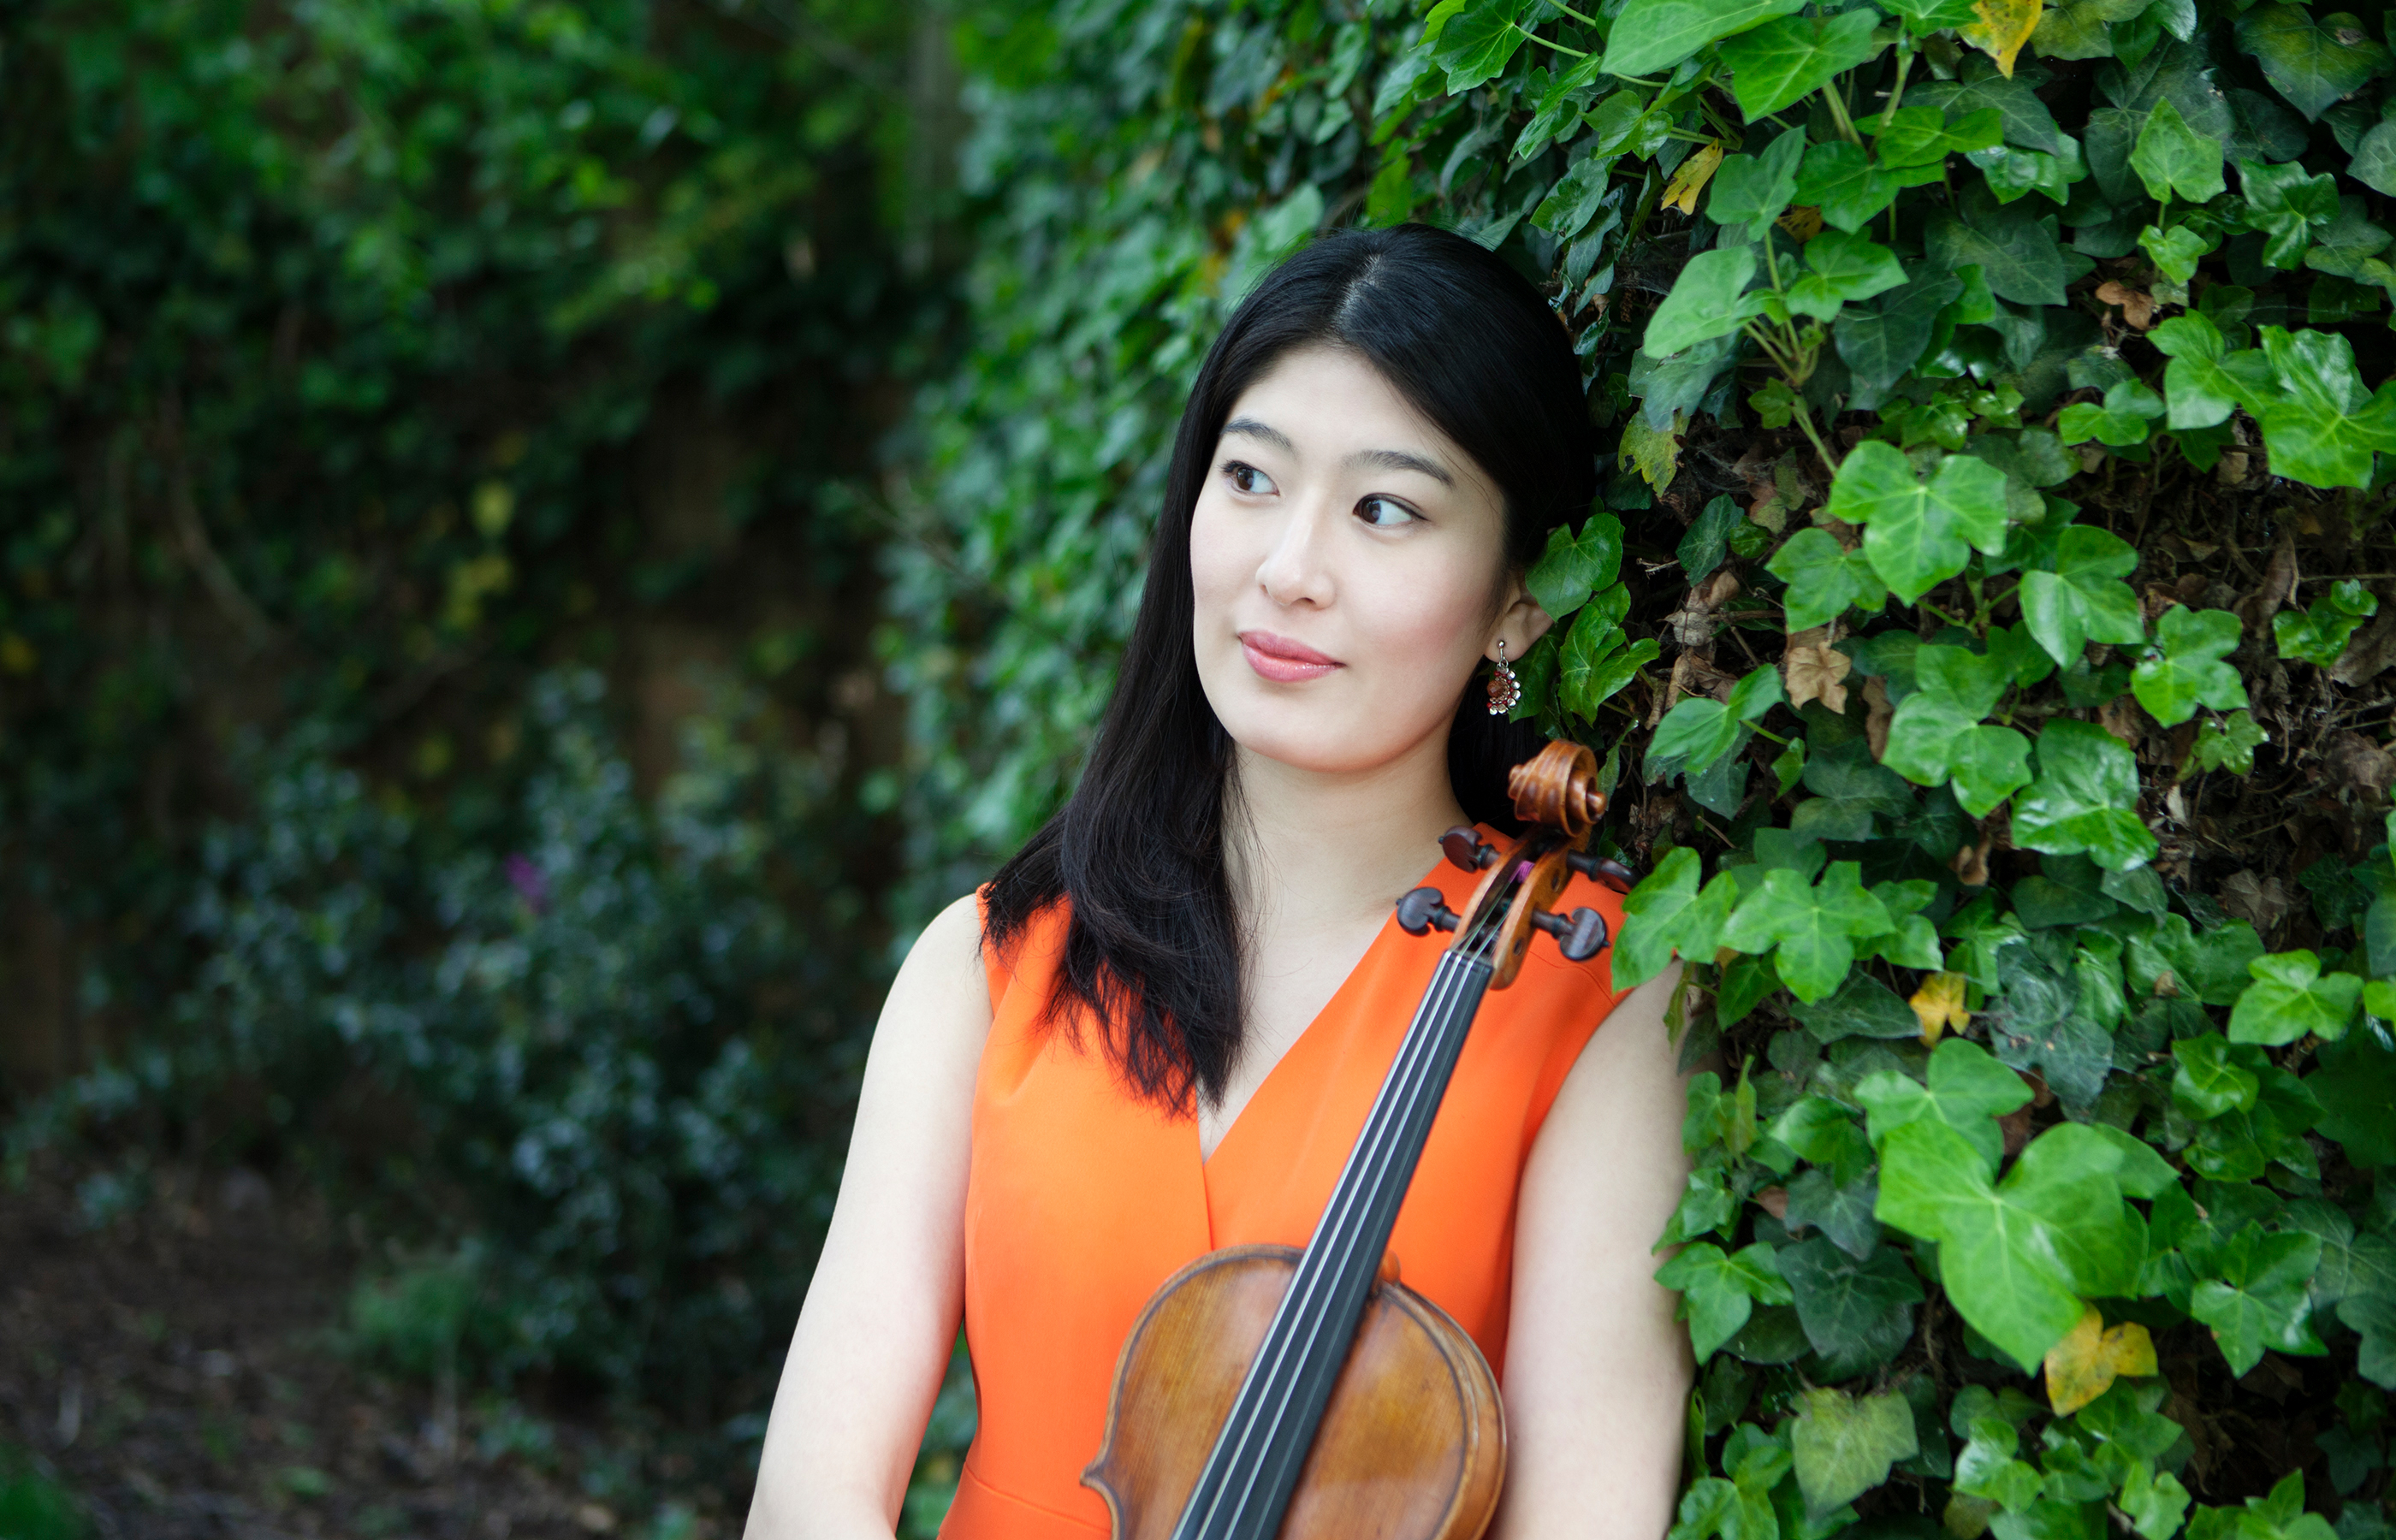 haru ushigusa violinist london